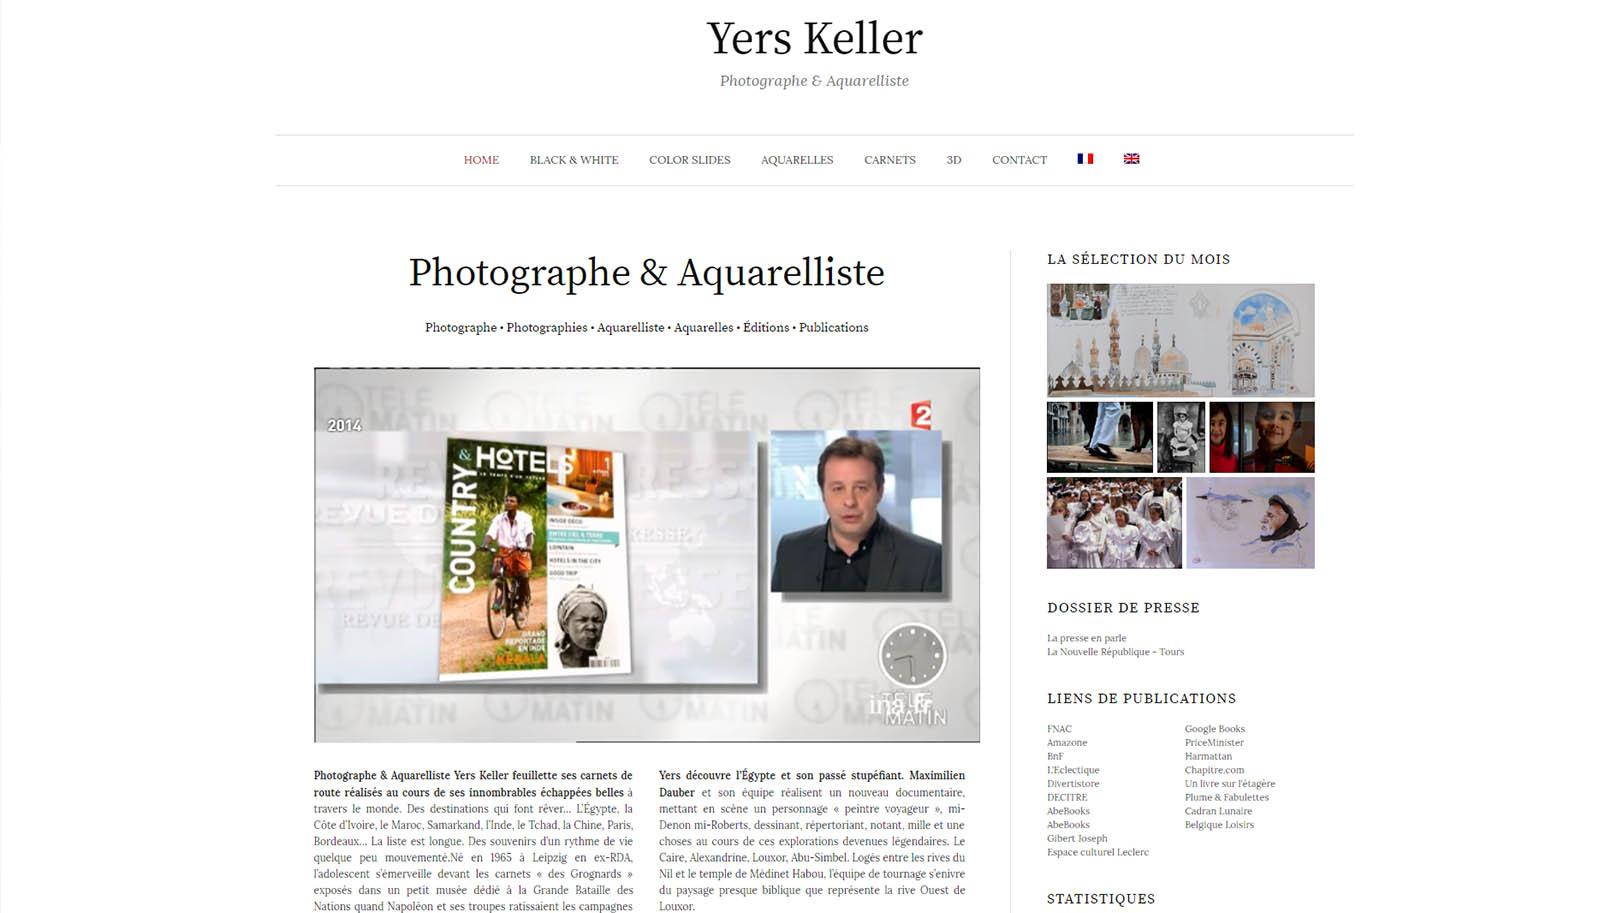 Yers Keller - Photographe Aquarelliste Carnetiste